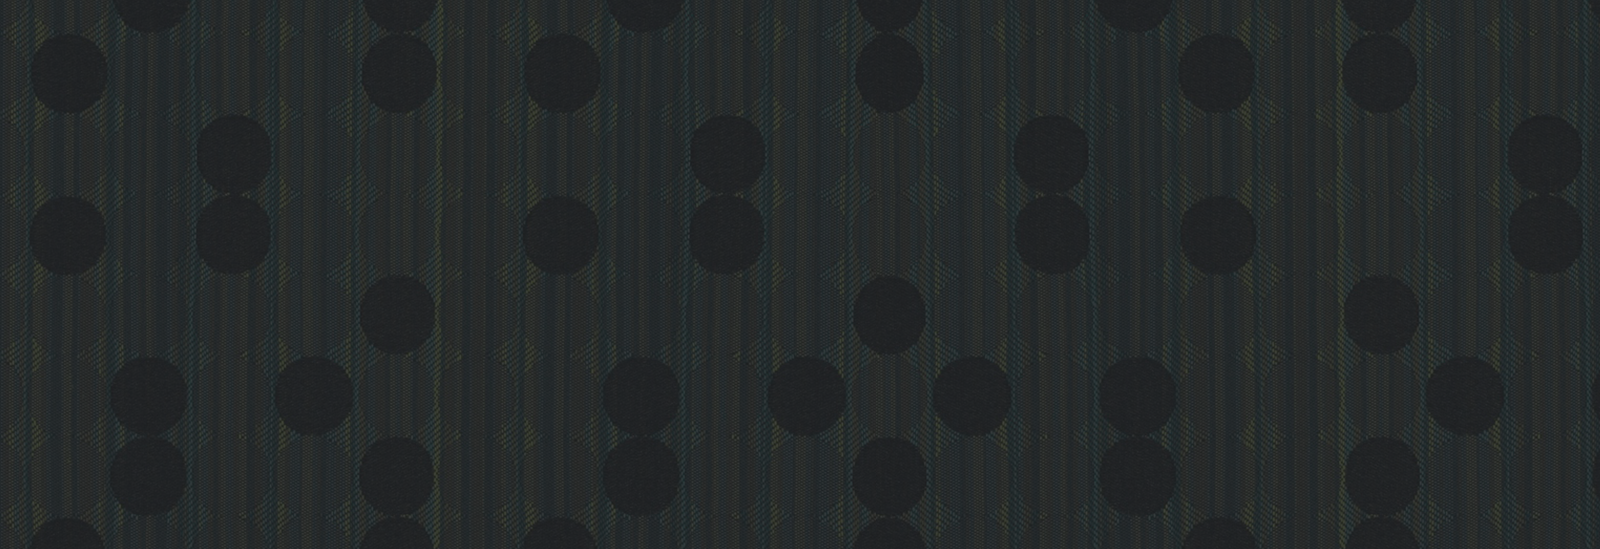 Pattern_Bkrd.png